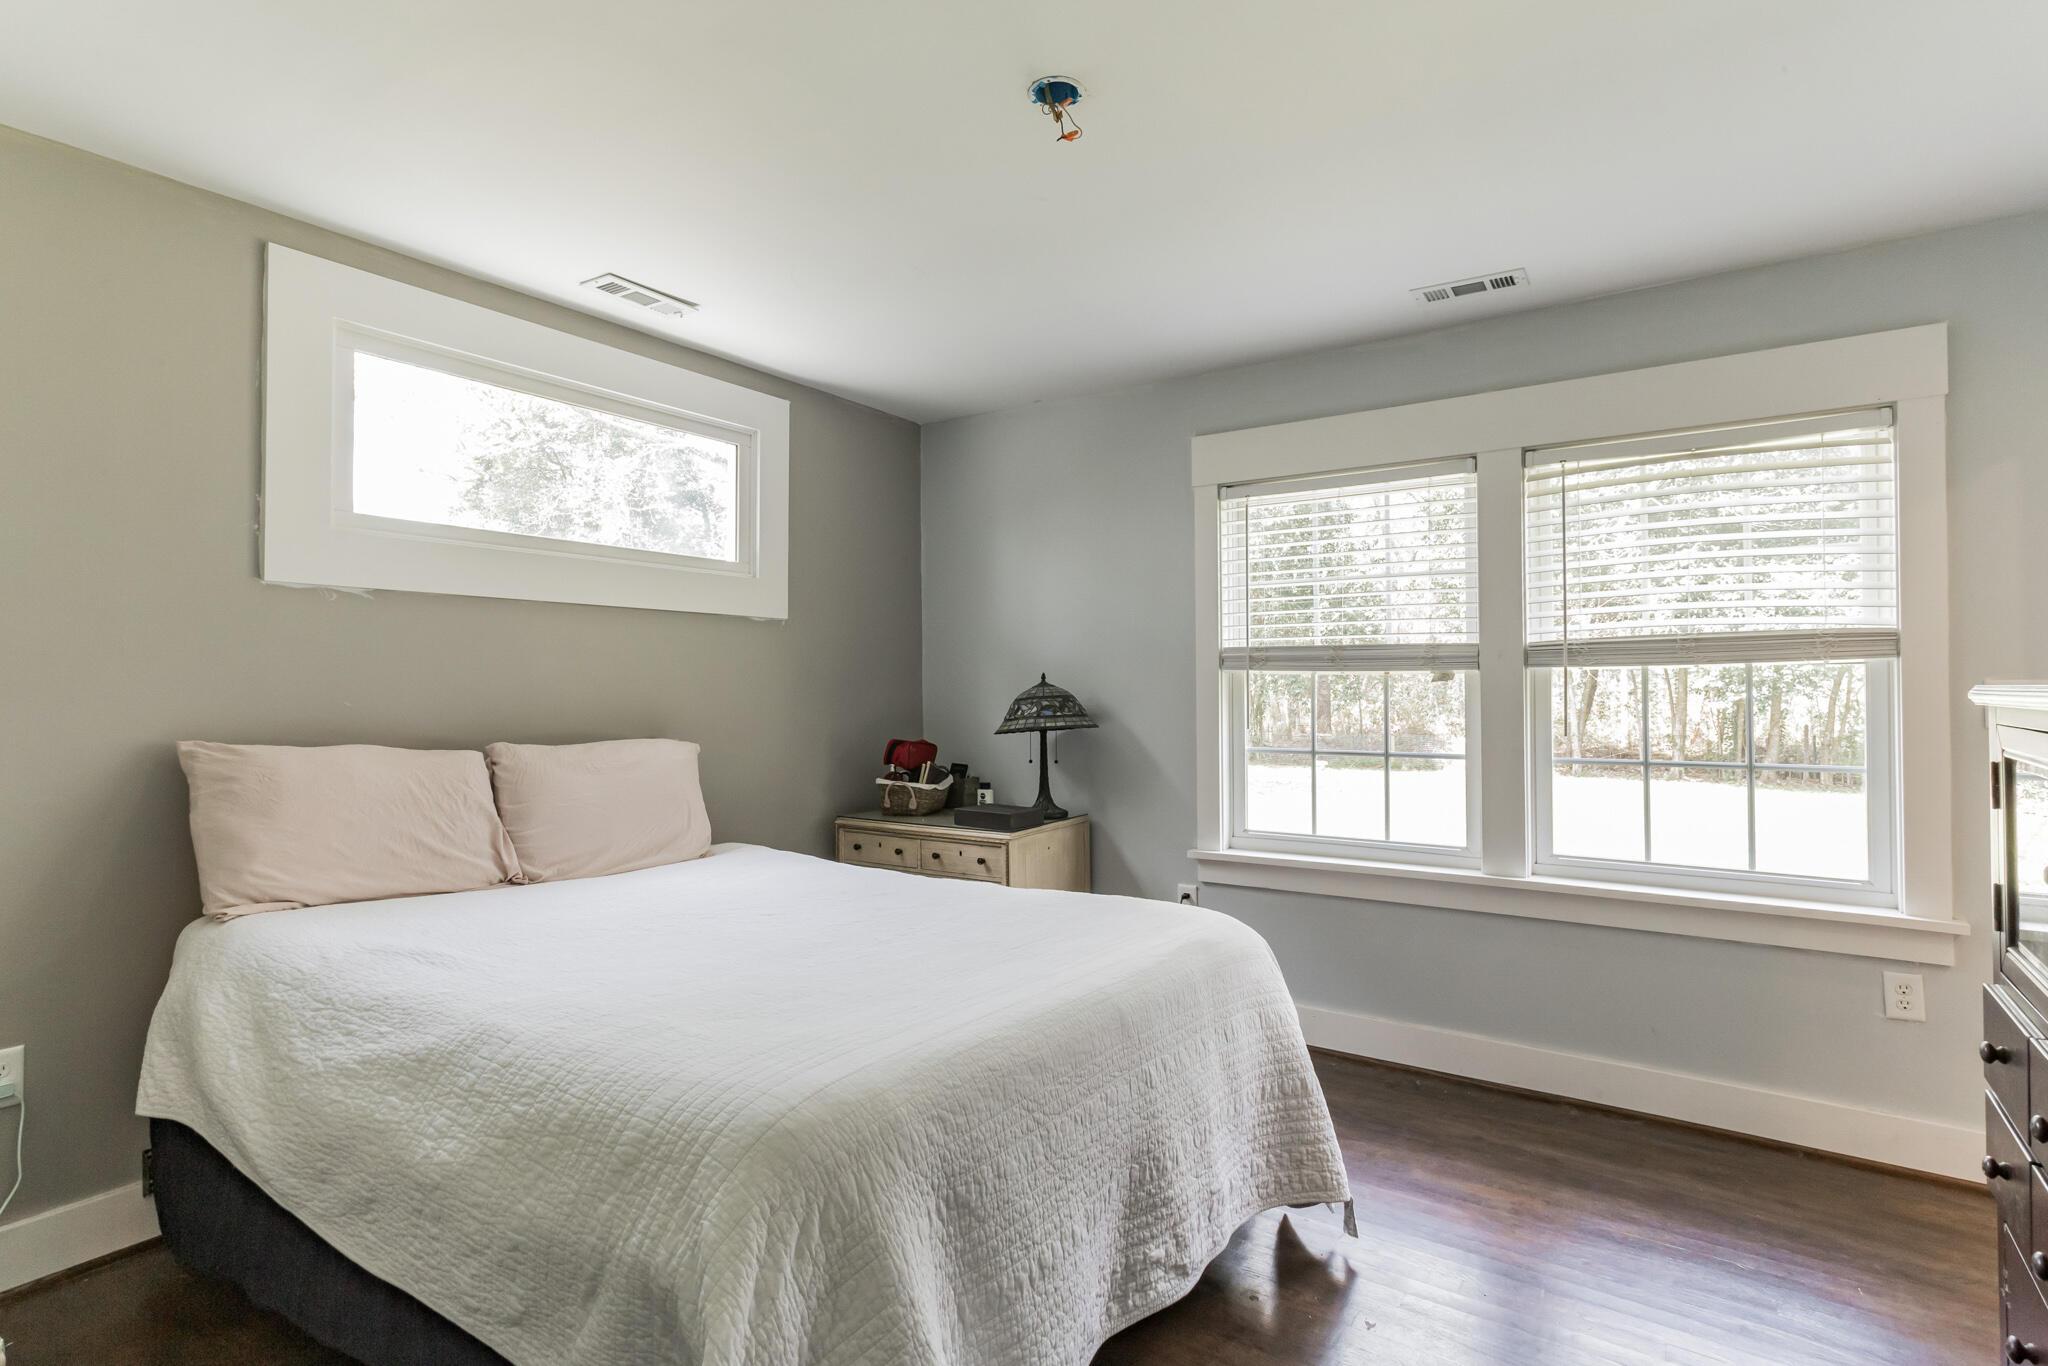 Stafford Heights Homes For Sale - 3472 Cynthia, Johns Island, SC - 10